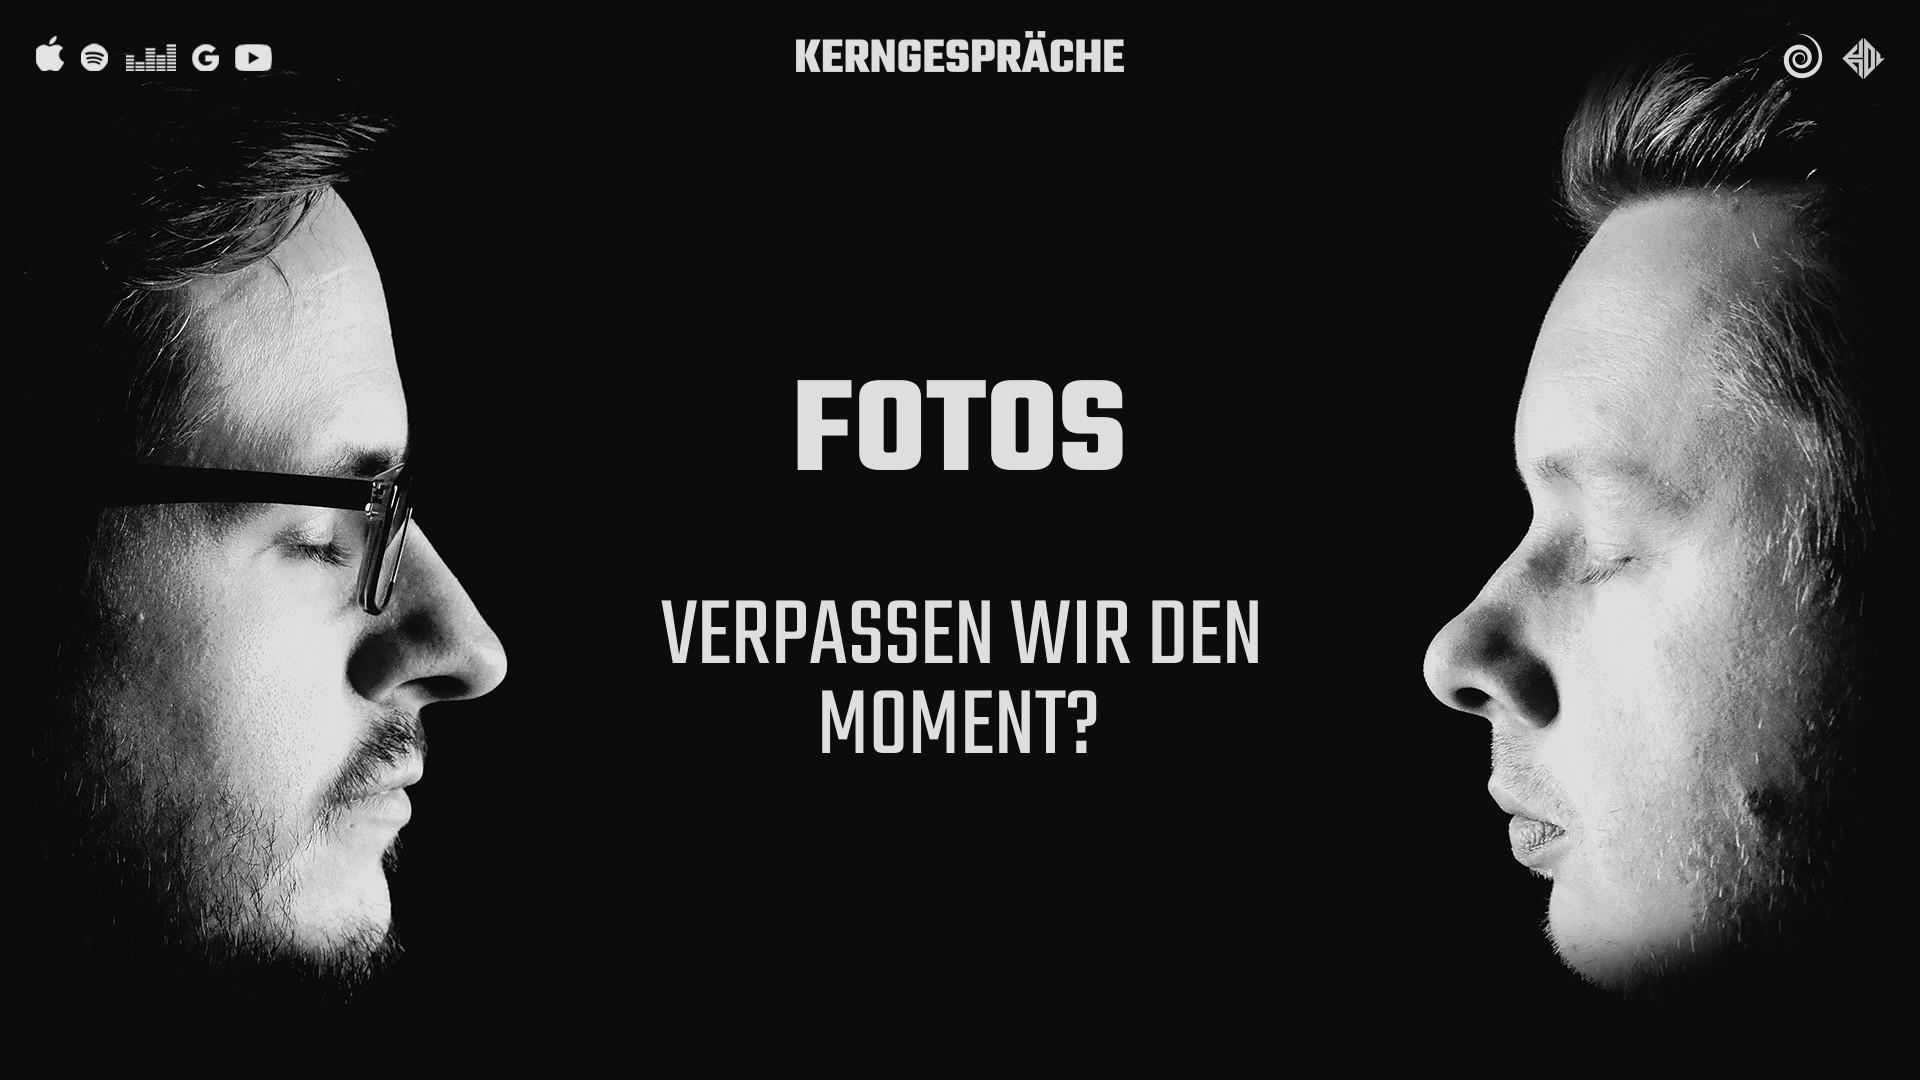 Fotos: Verpassen wir den Moment?